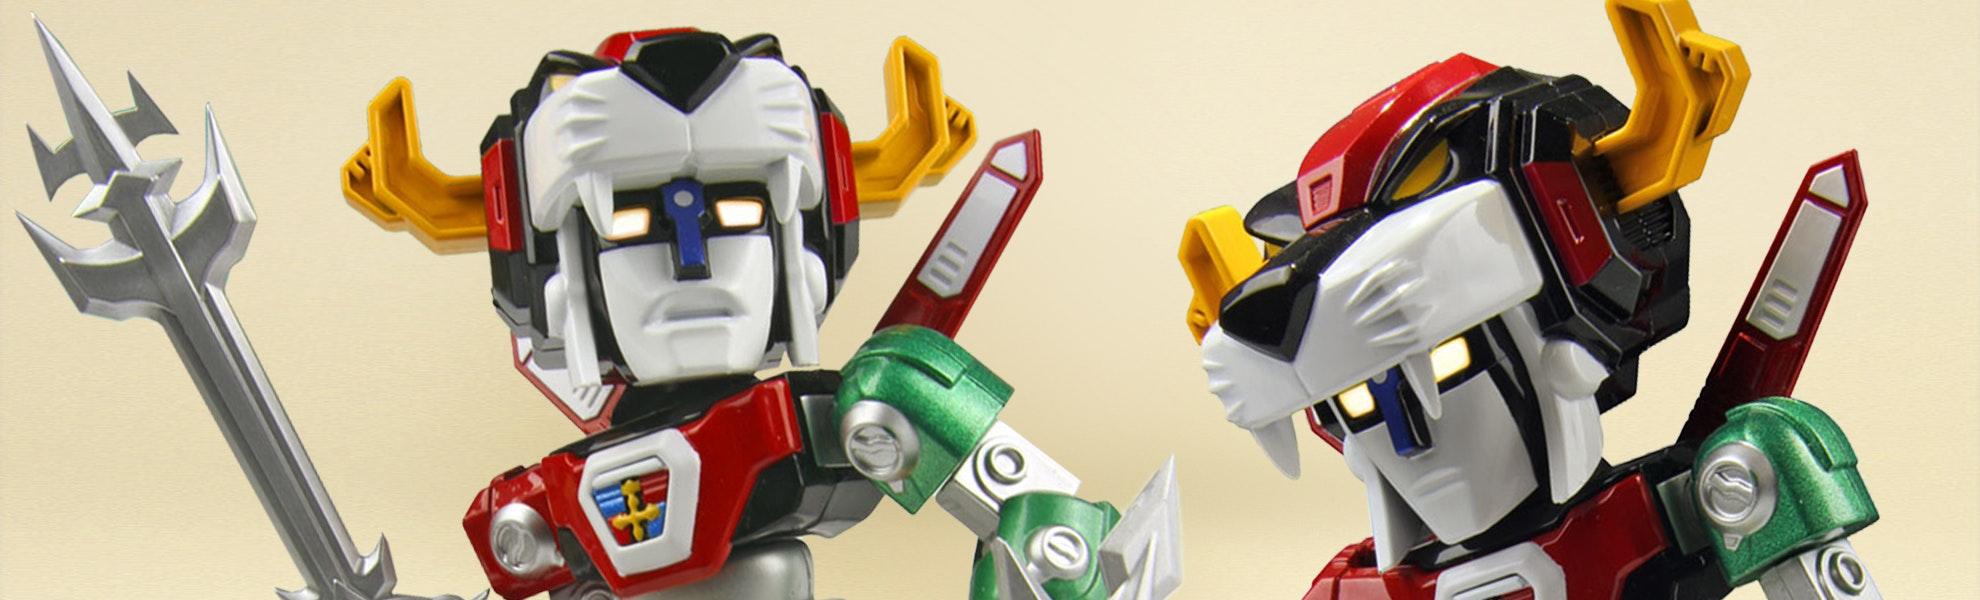 Toynami Voltron Super Poseable Action Figure